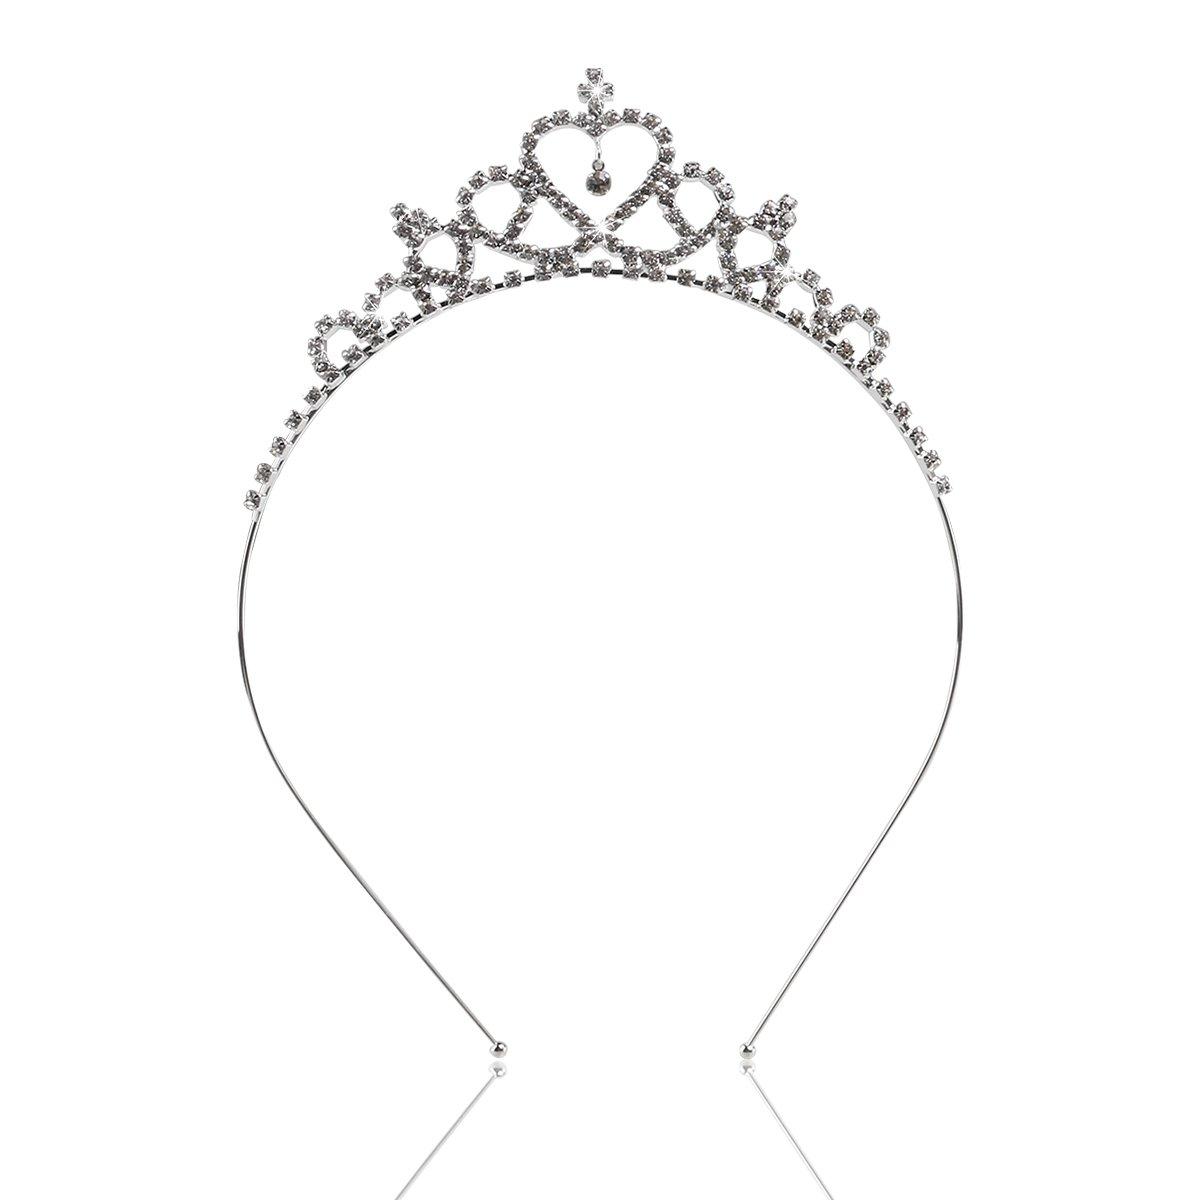 Tinksky Delicate Wedding Party Children Flower Girl Crystal Rhinestones Heart Shaped Crown Headband Tiara (Silver)